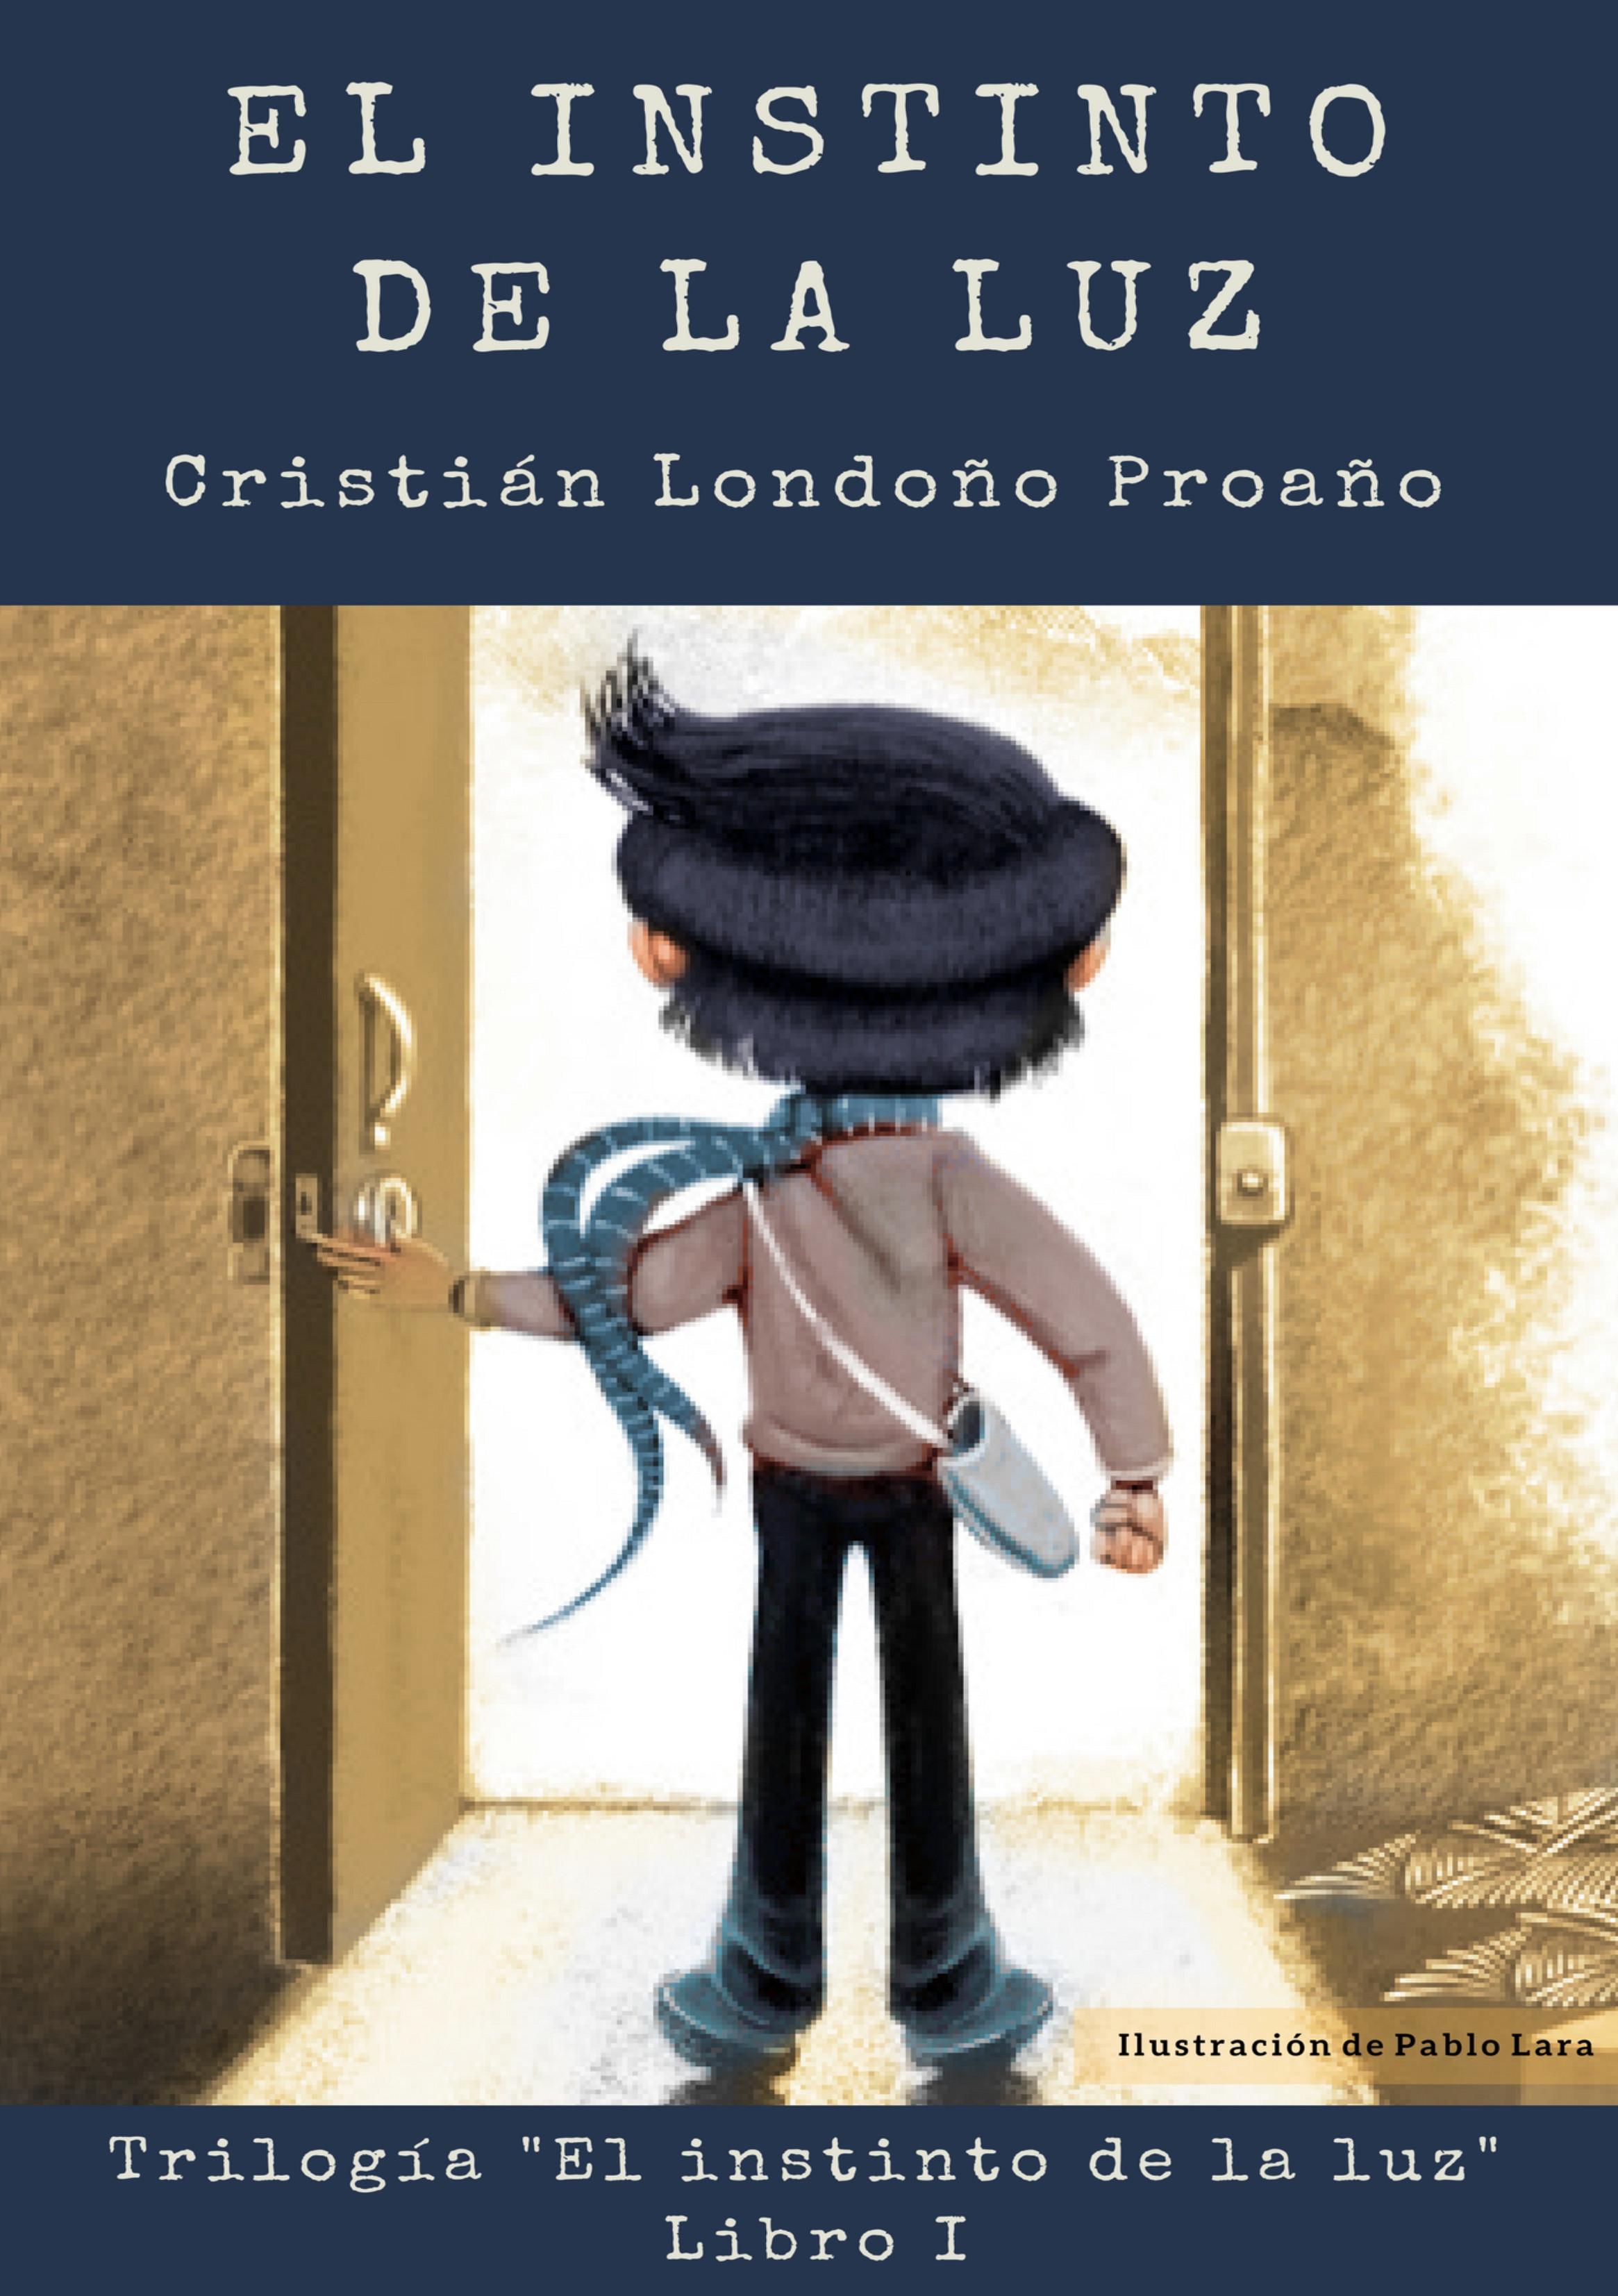 Read More From Cristián Londoño Proaño